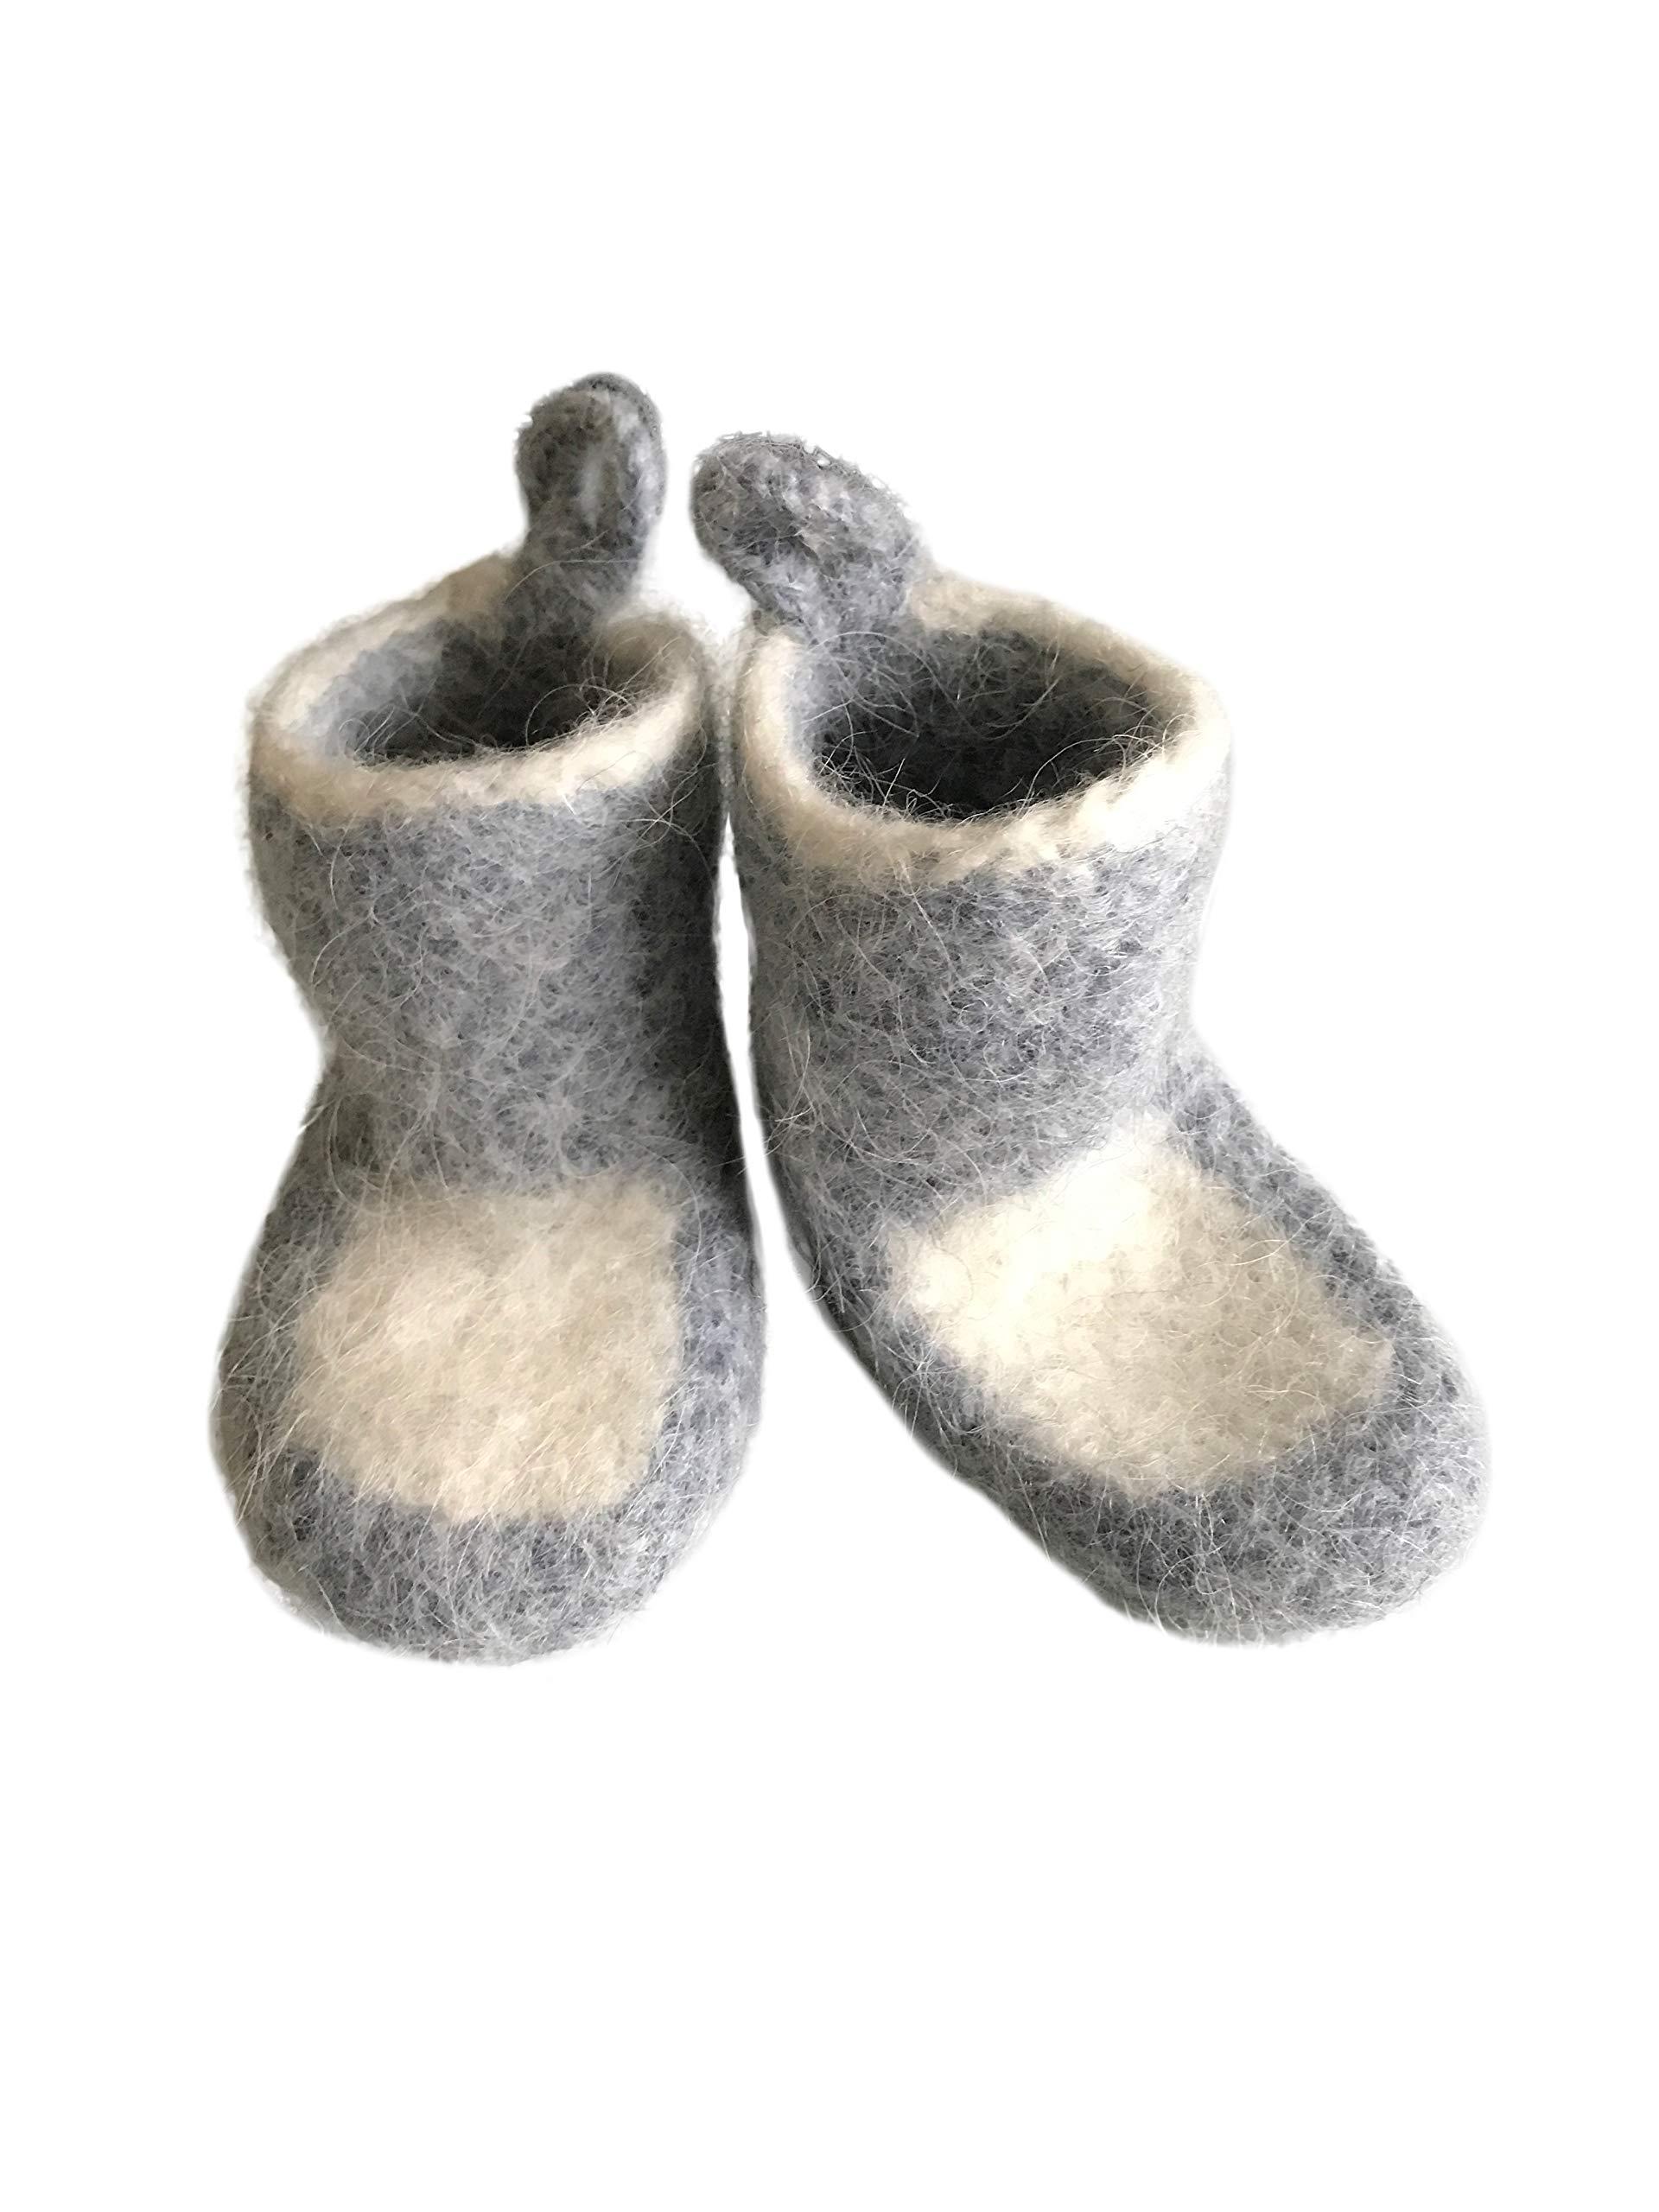 Baby Warm Cozy Wool House Booties Socks Pure Wool. Newborn Boys Girls. Eco Gift by Kosy Sheep